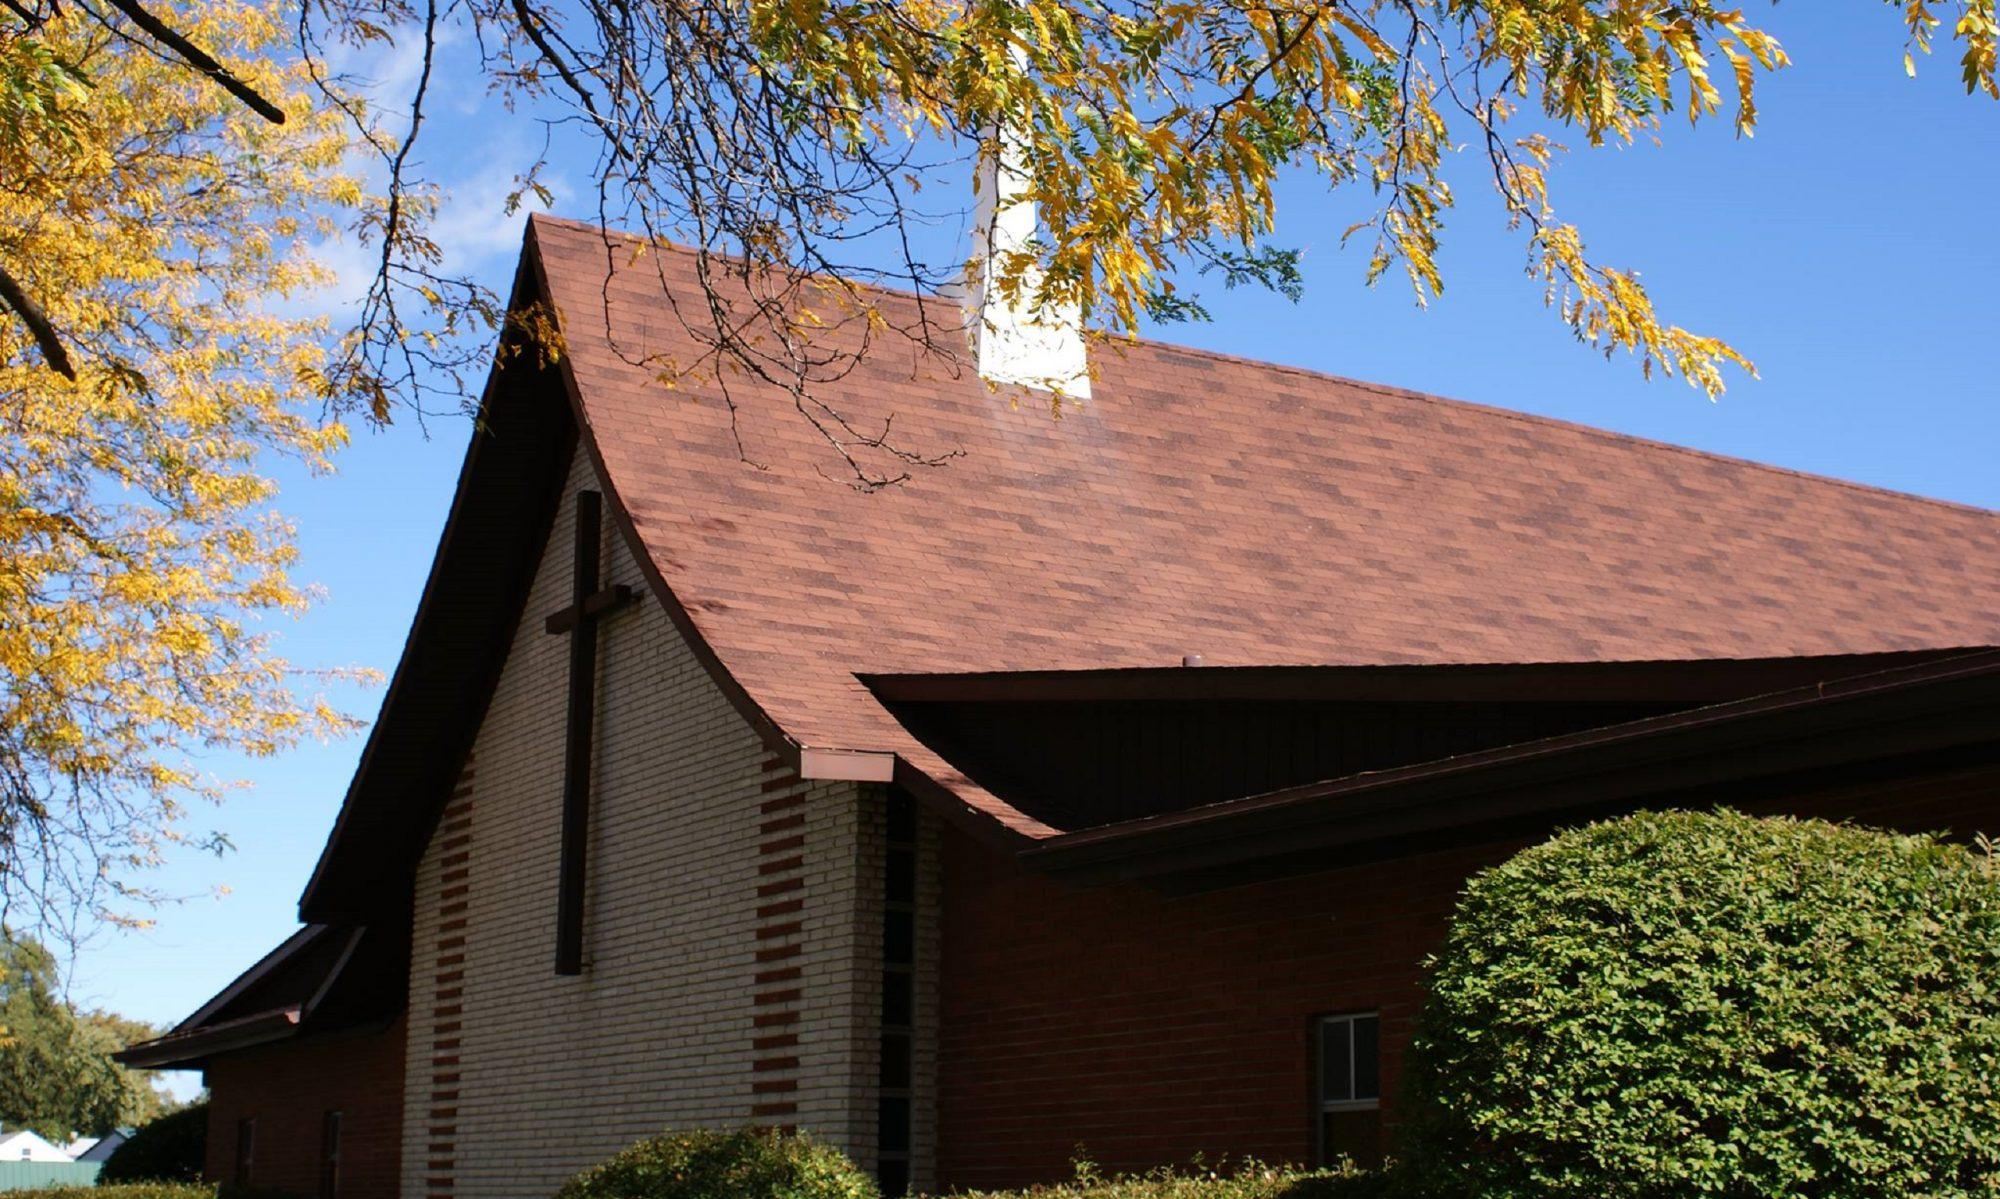 Lakeview Church